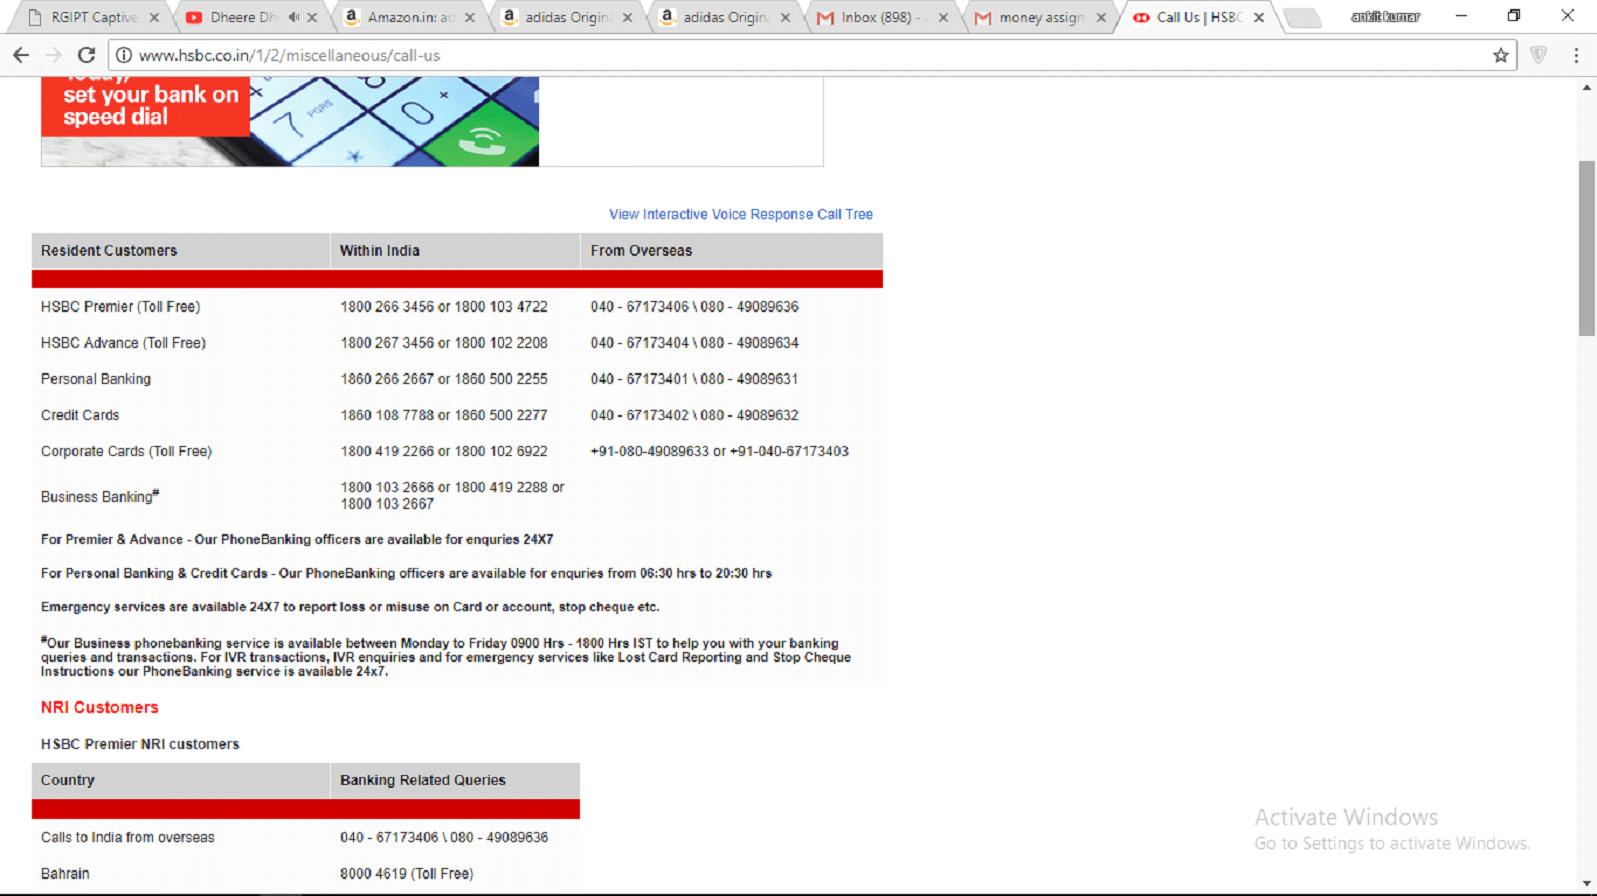 hsbc bank credit card application status india